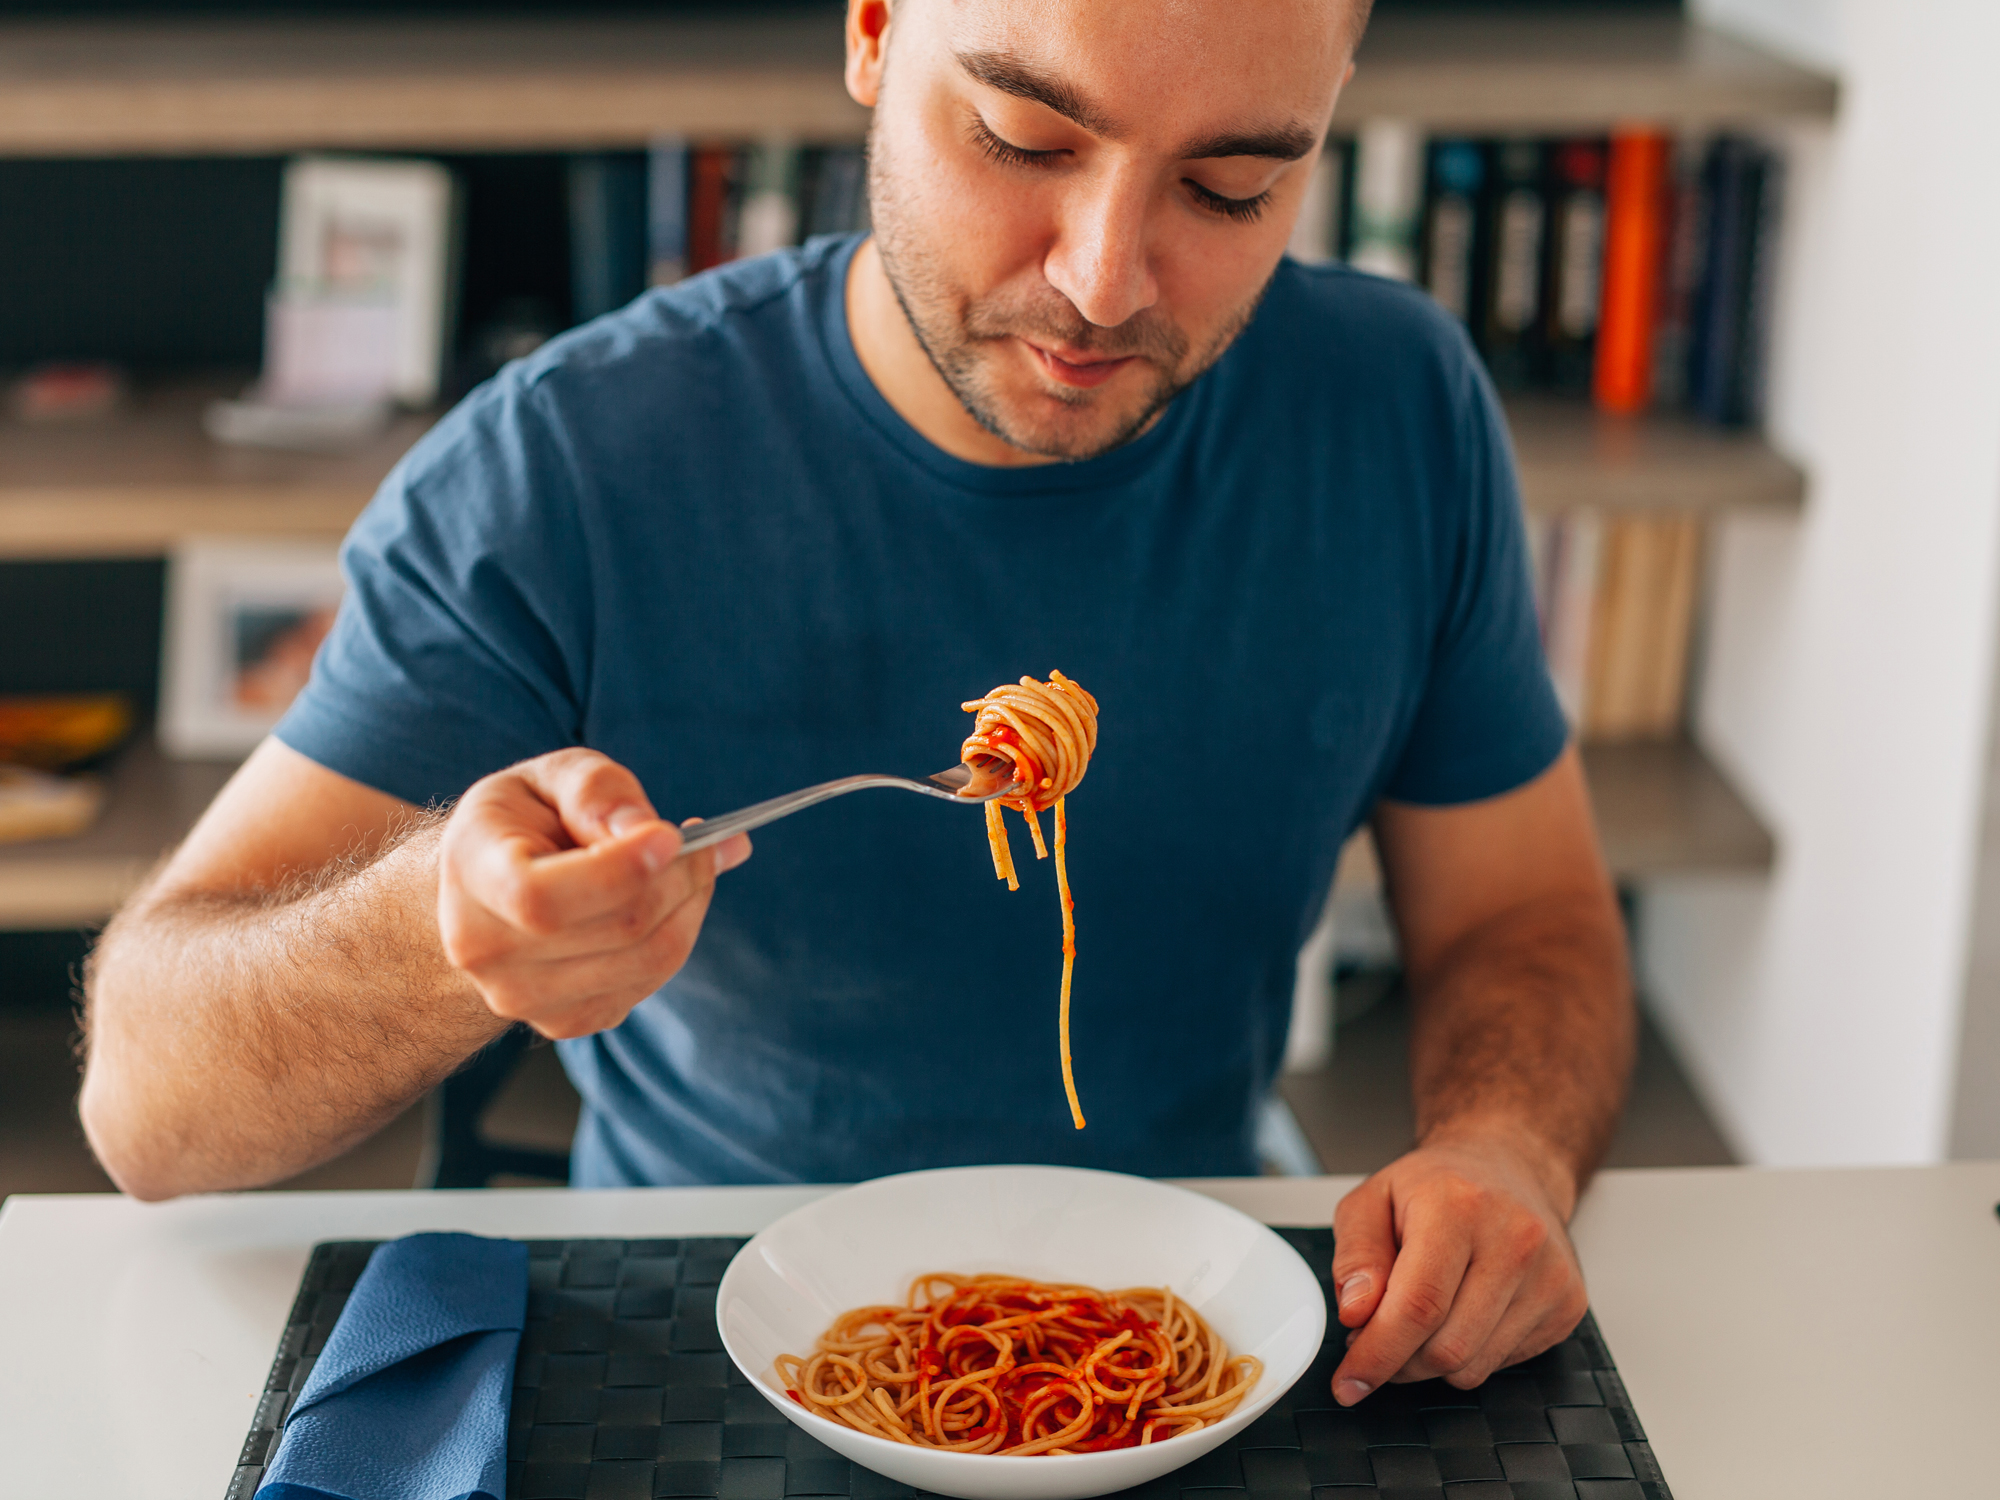 Foods To Avoid With Prostatitis